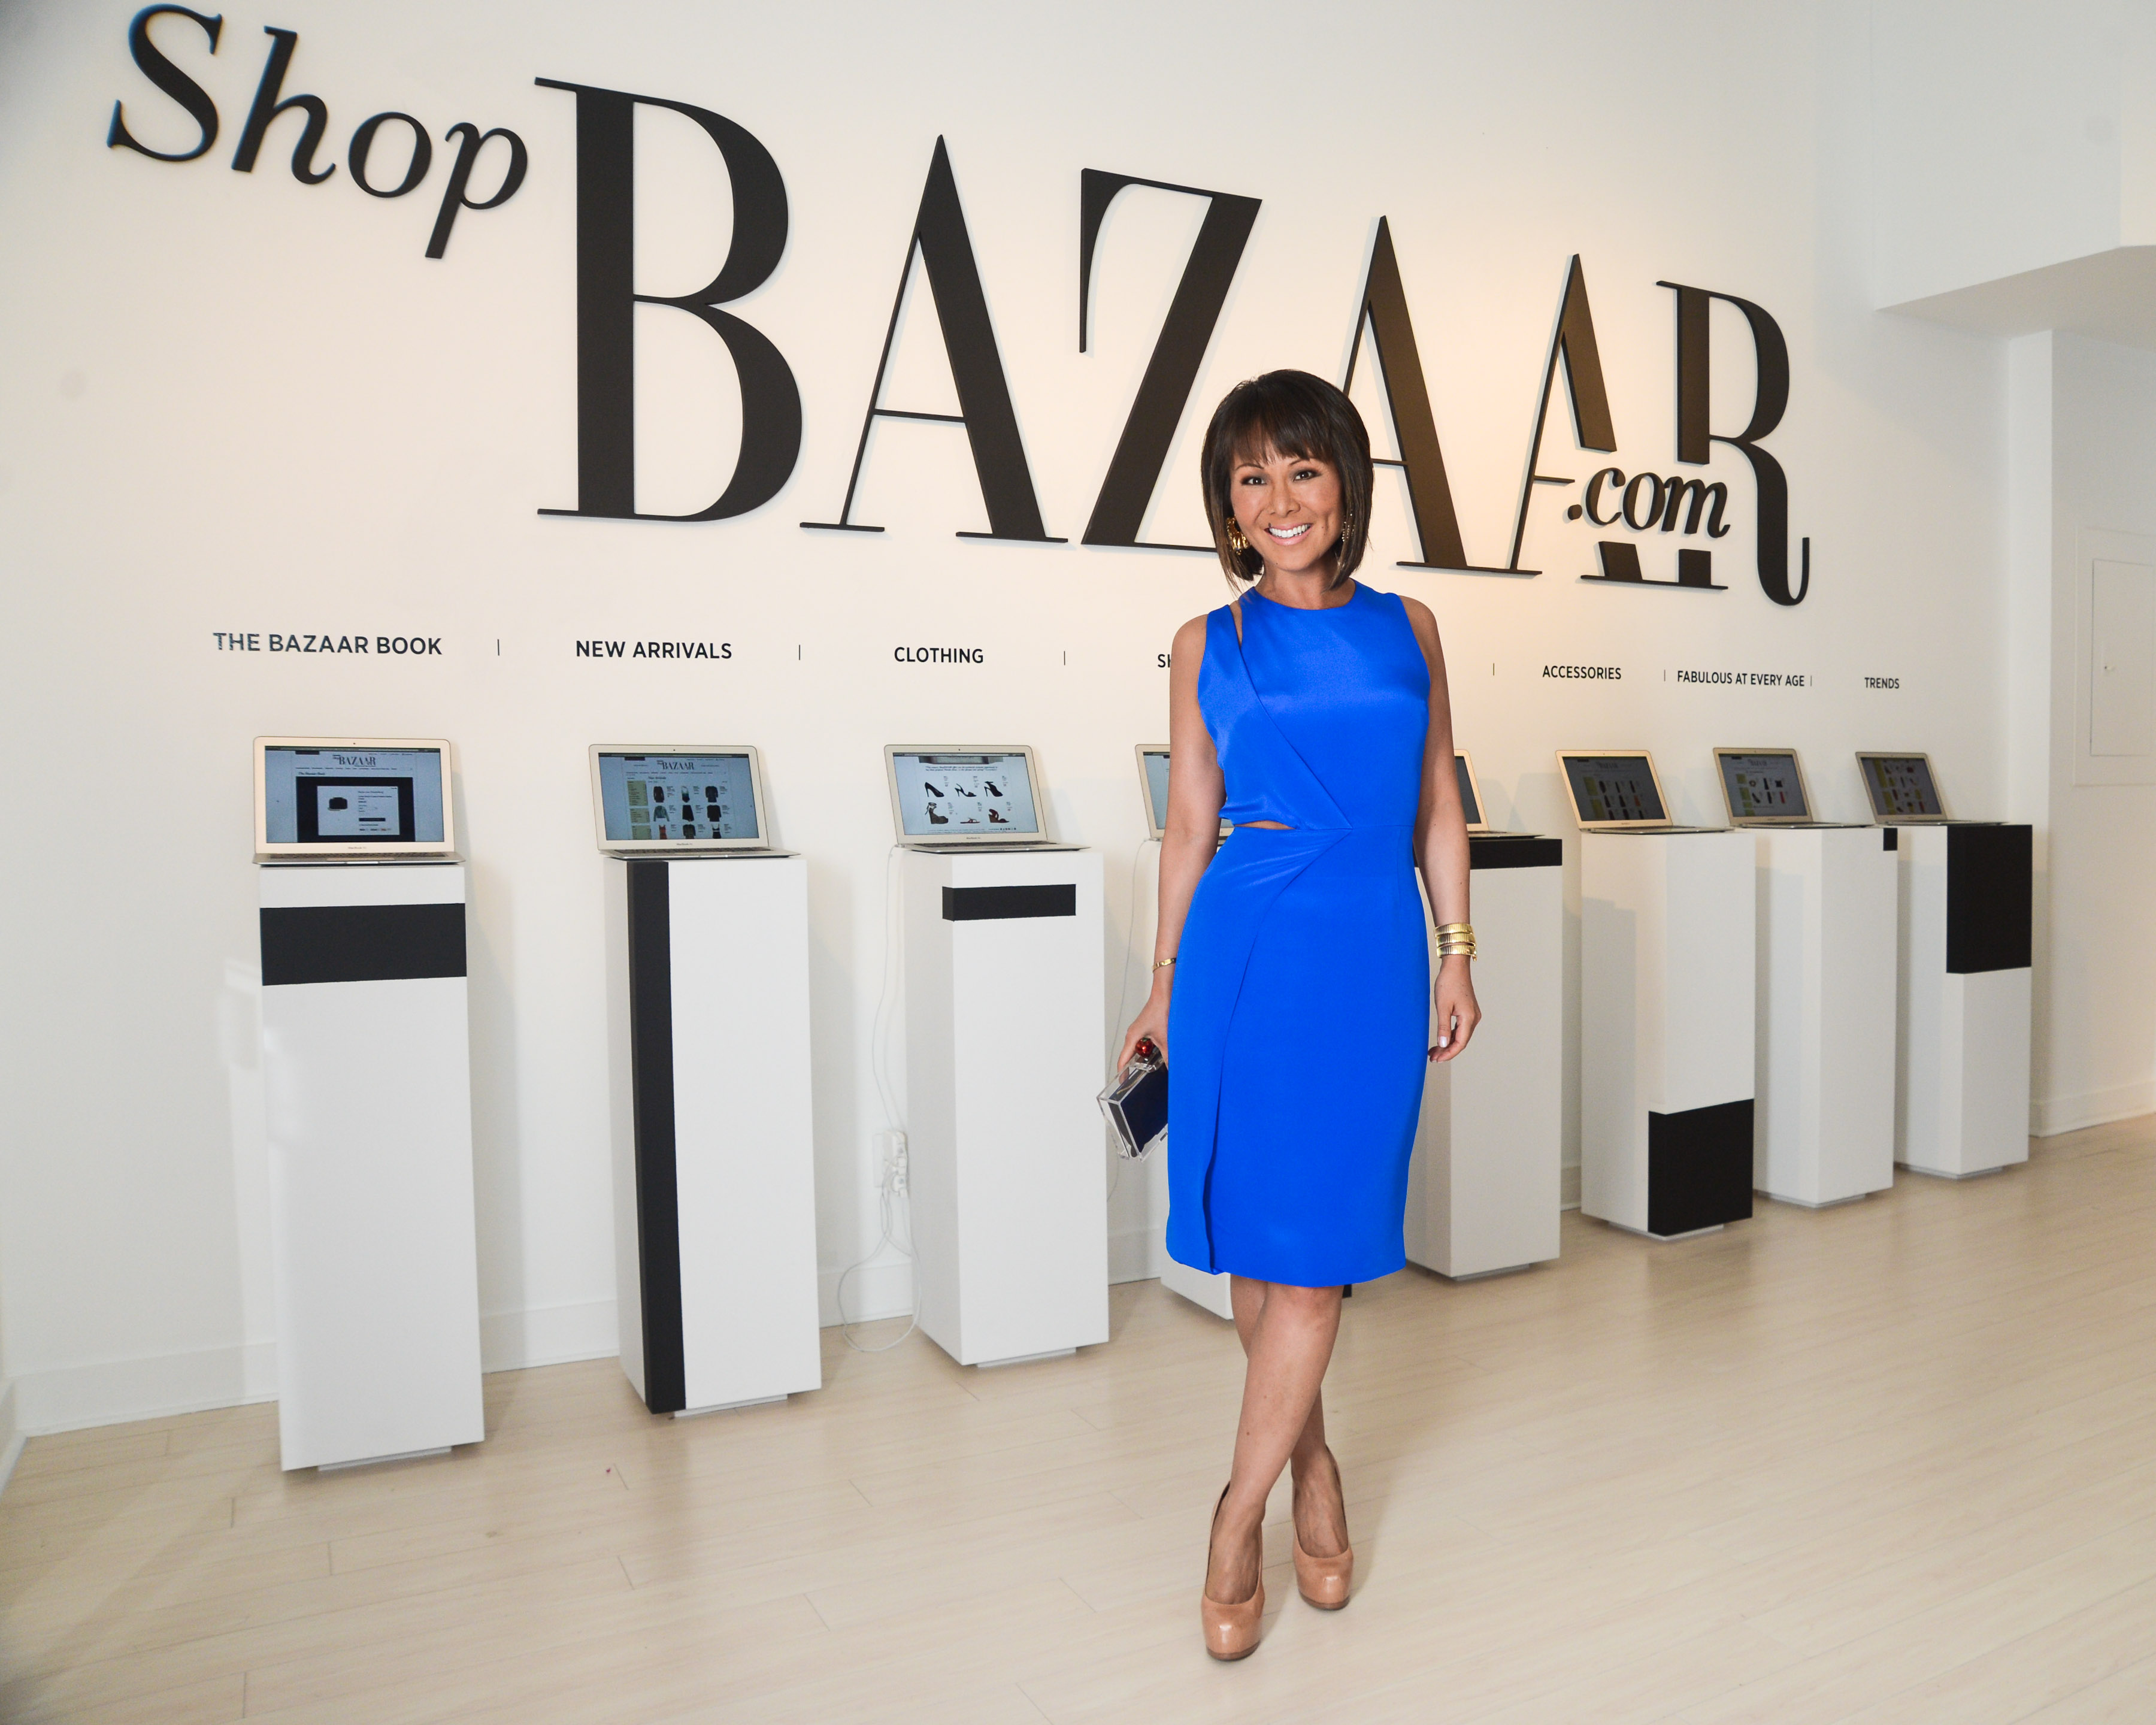 Alino Cho - Harper's BAZAAR Editor-in-Chief, Glenda Bailey hosts an exclusive cocktail reception to celebrate ShopBAZAAR during Art Basel Miami Beach with a menu by Chef John DeLucie